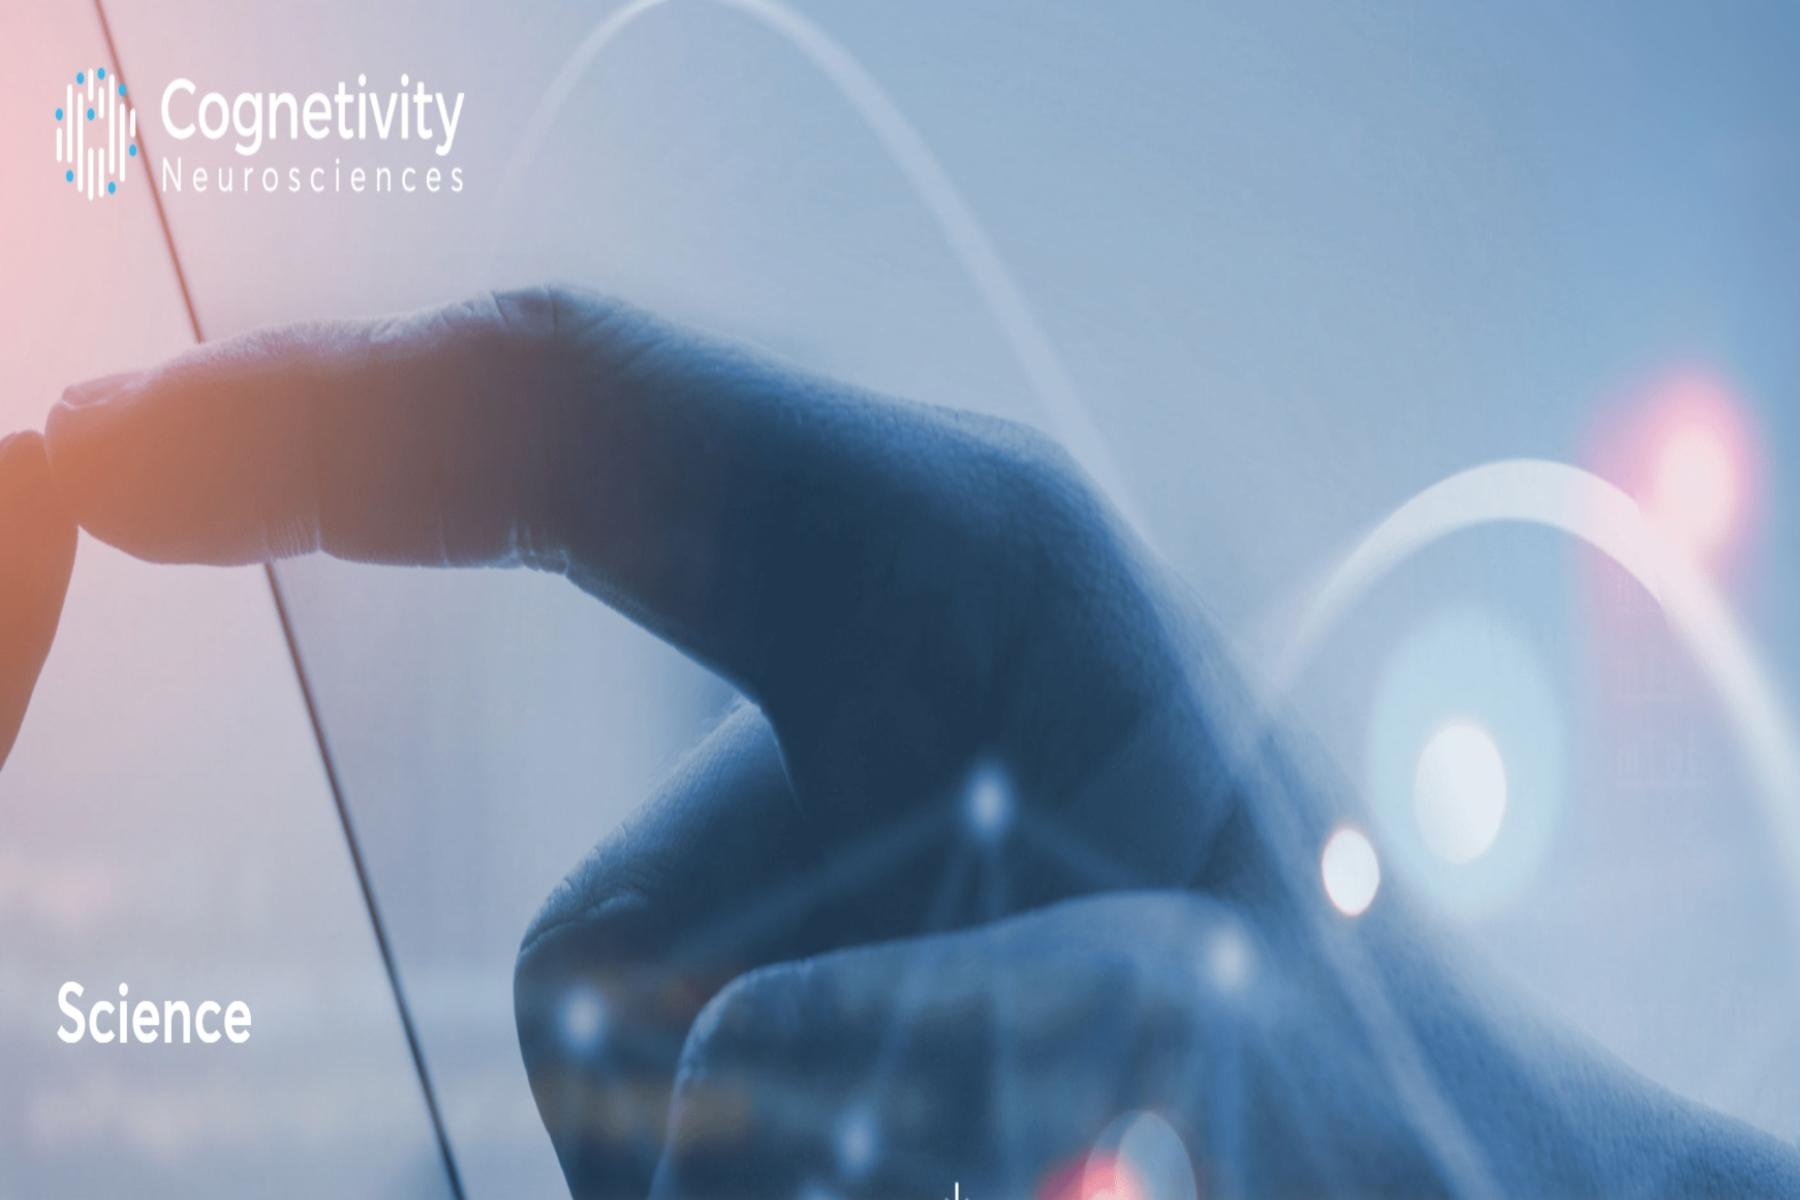 Cognetivity Neurosciences: Η εταιρεία αναδείχθηκε νικήτρια στα Health Tech Awards 2021